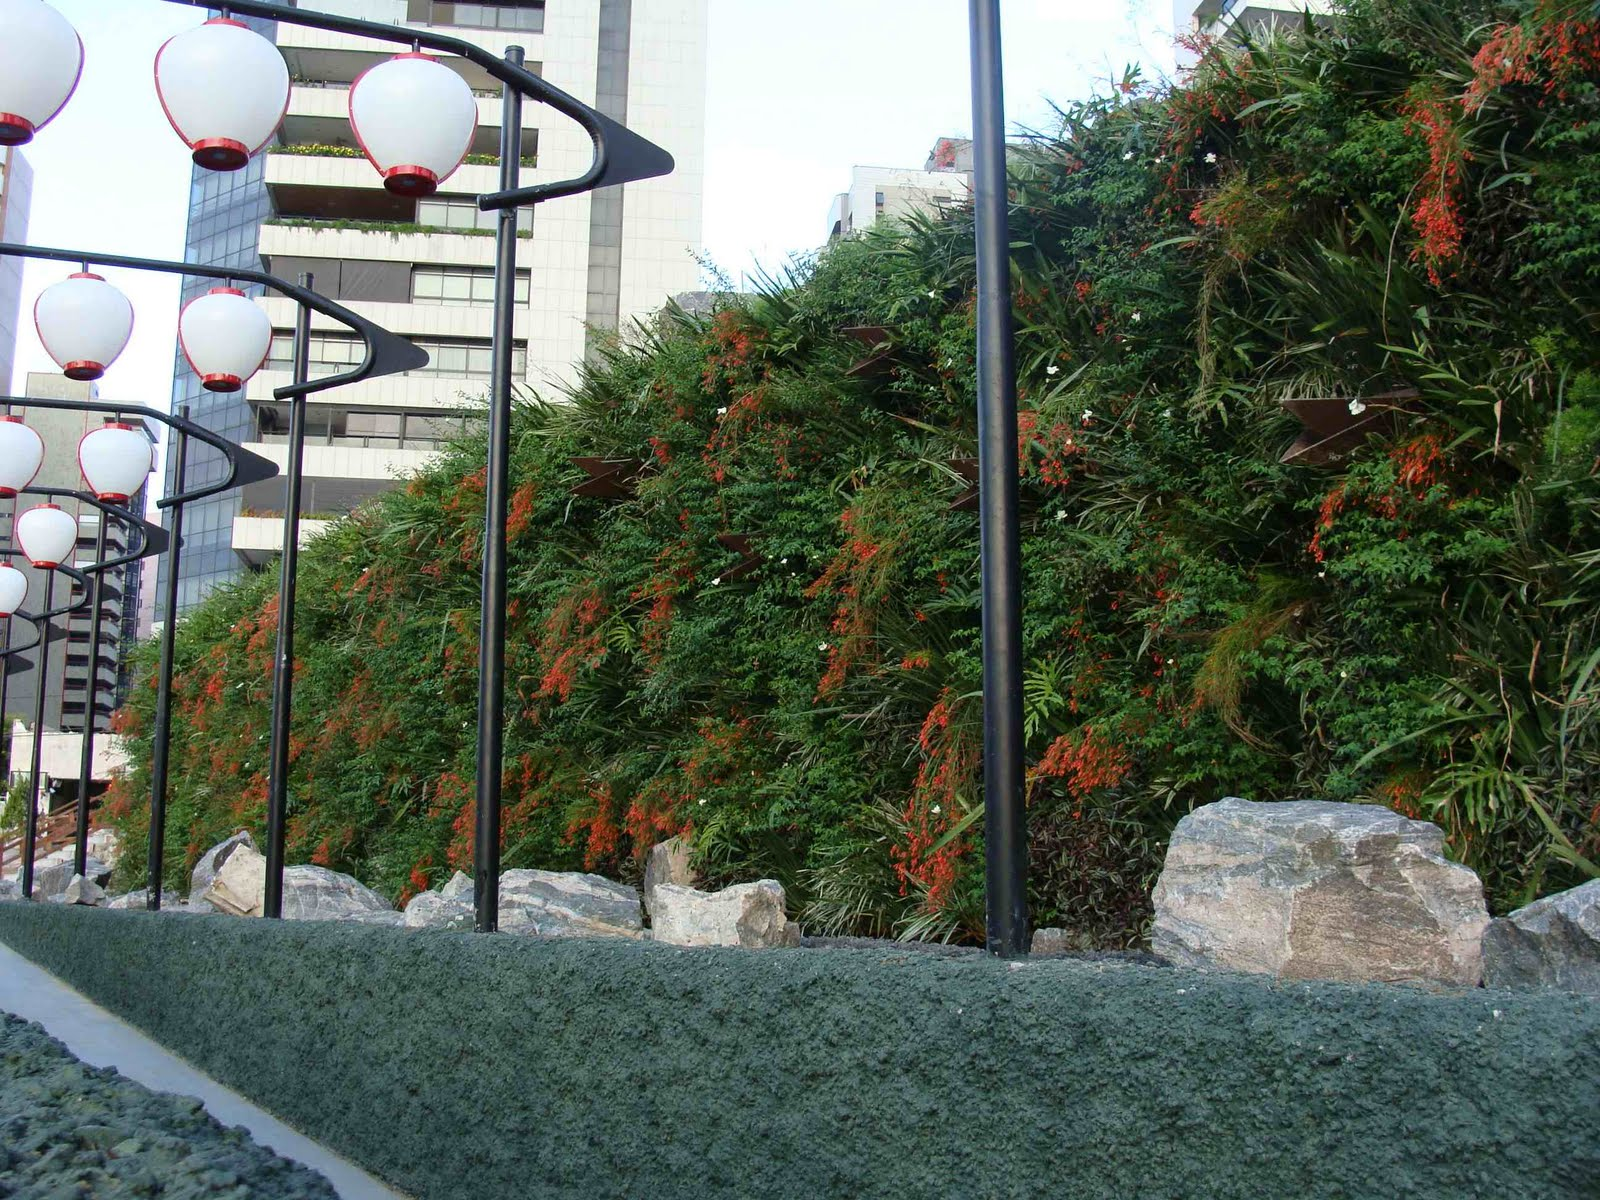 plantas jardim japones:Caderninho da Tia Helo: Jardim Japonês (2)